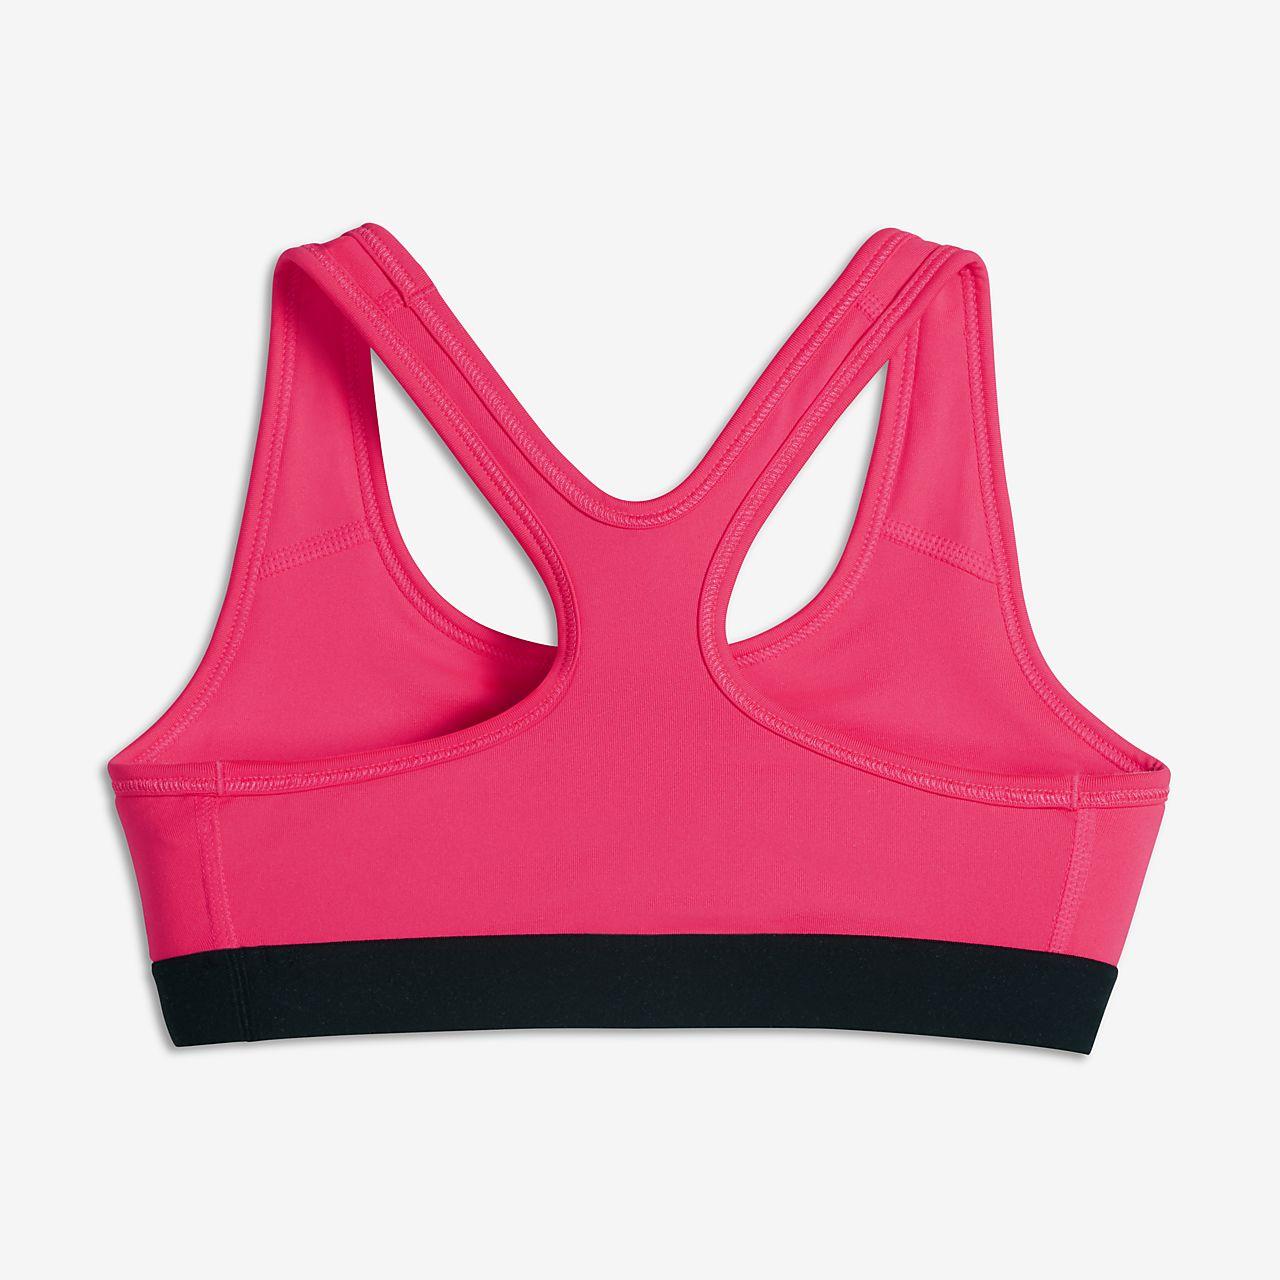 Nike Classic Big Kids Girls Sports Bra Nikecom-3732